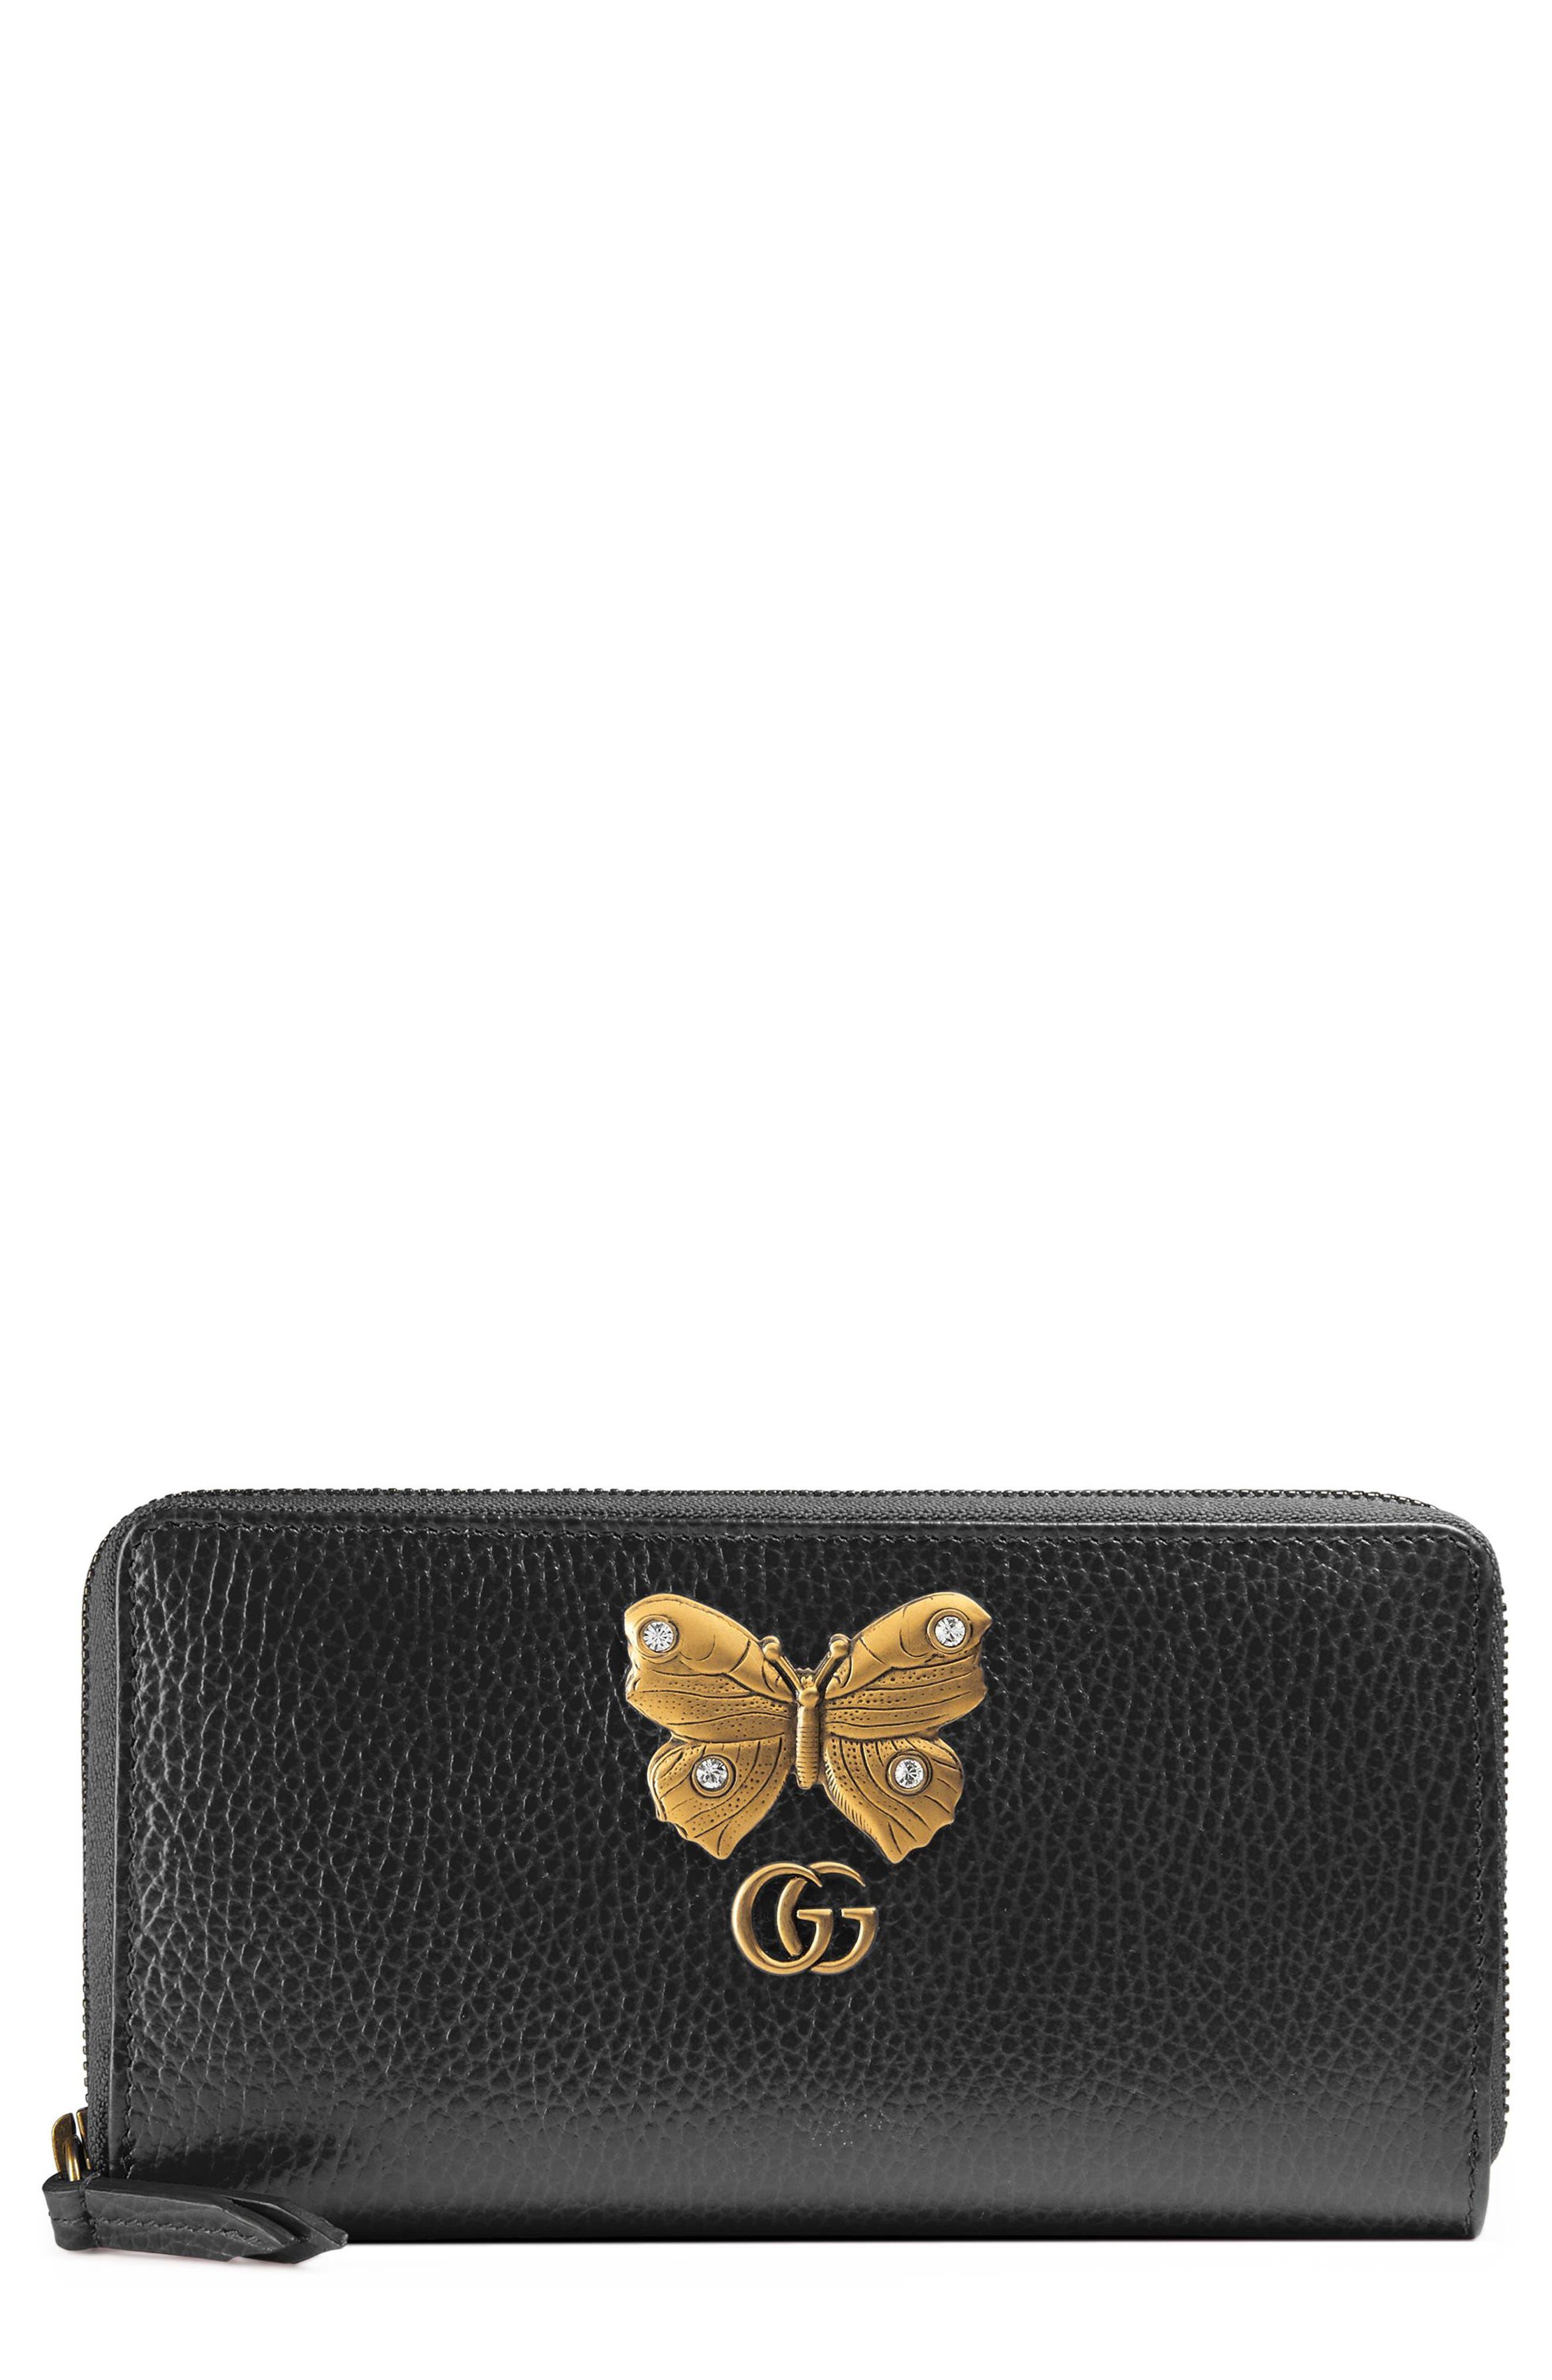 GUCCI Farfalla Zip Around Leather Wallet, Main, color, NERO/ CRYSTAL